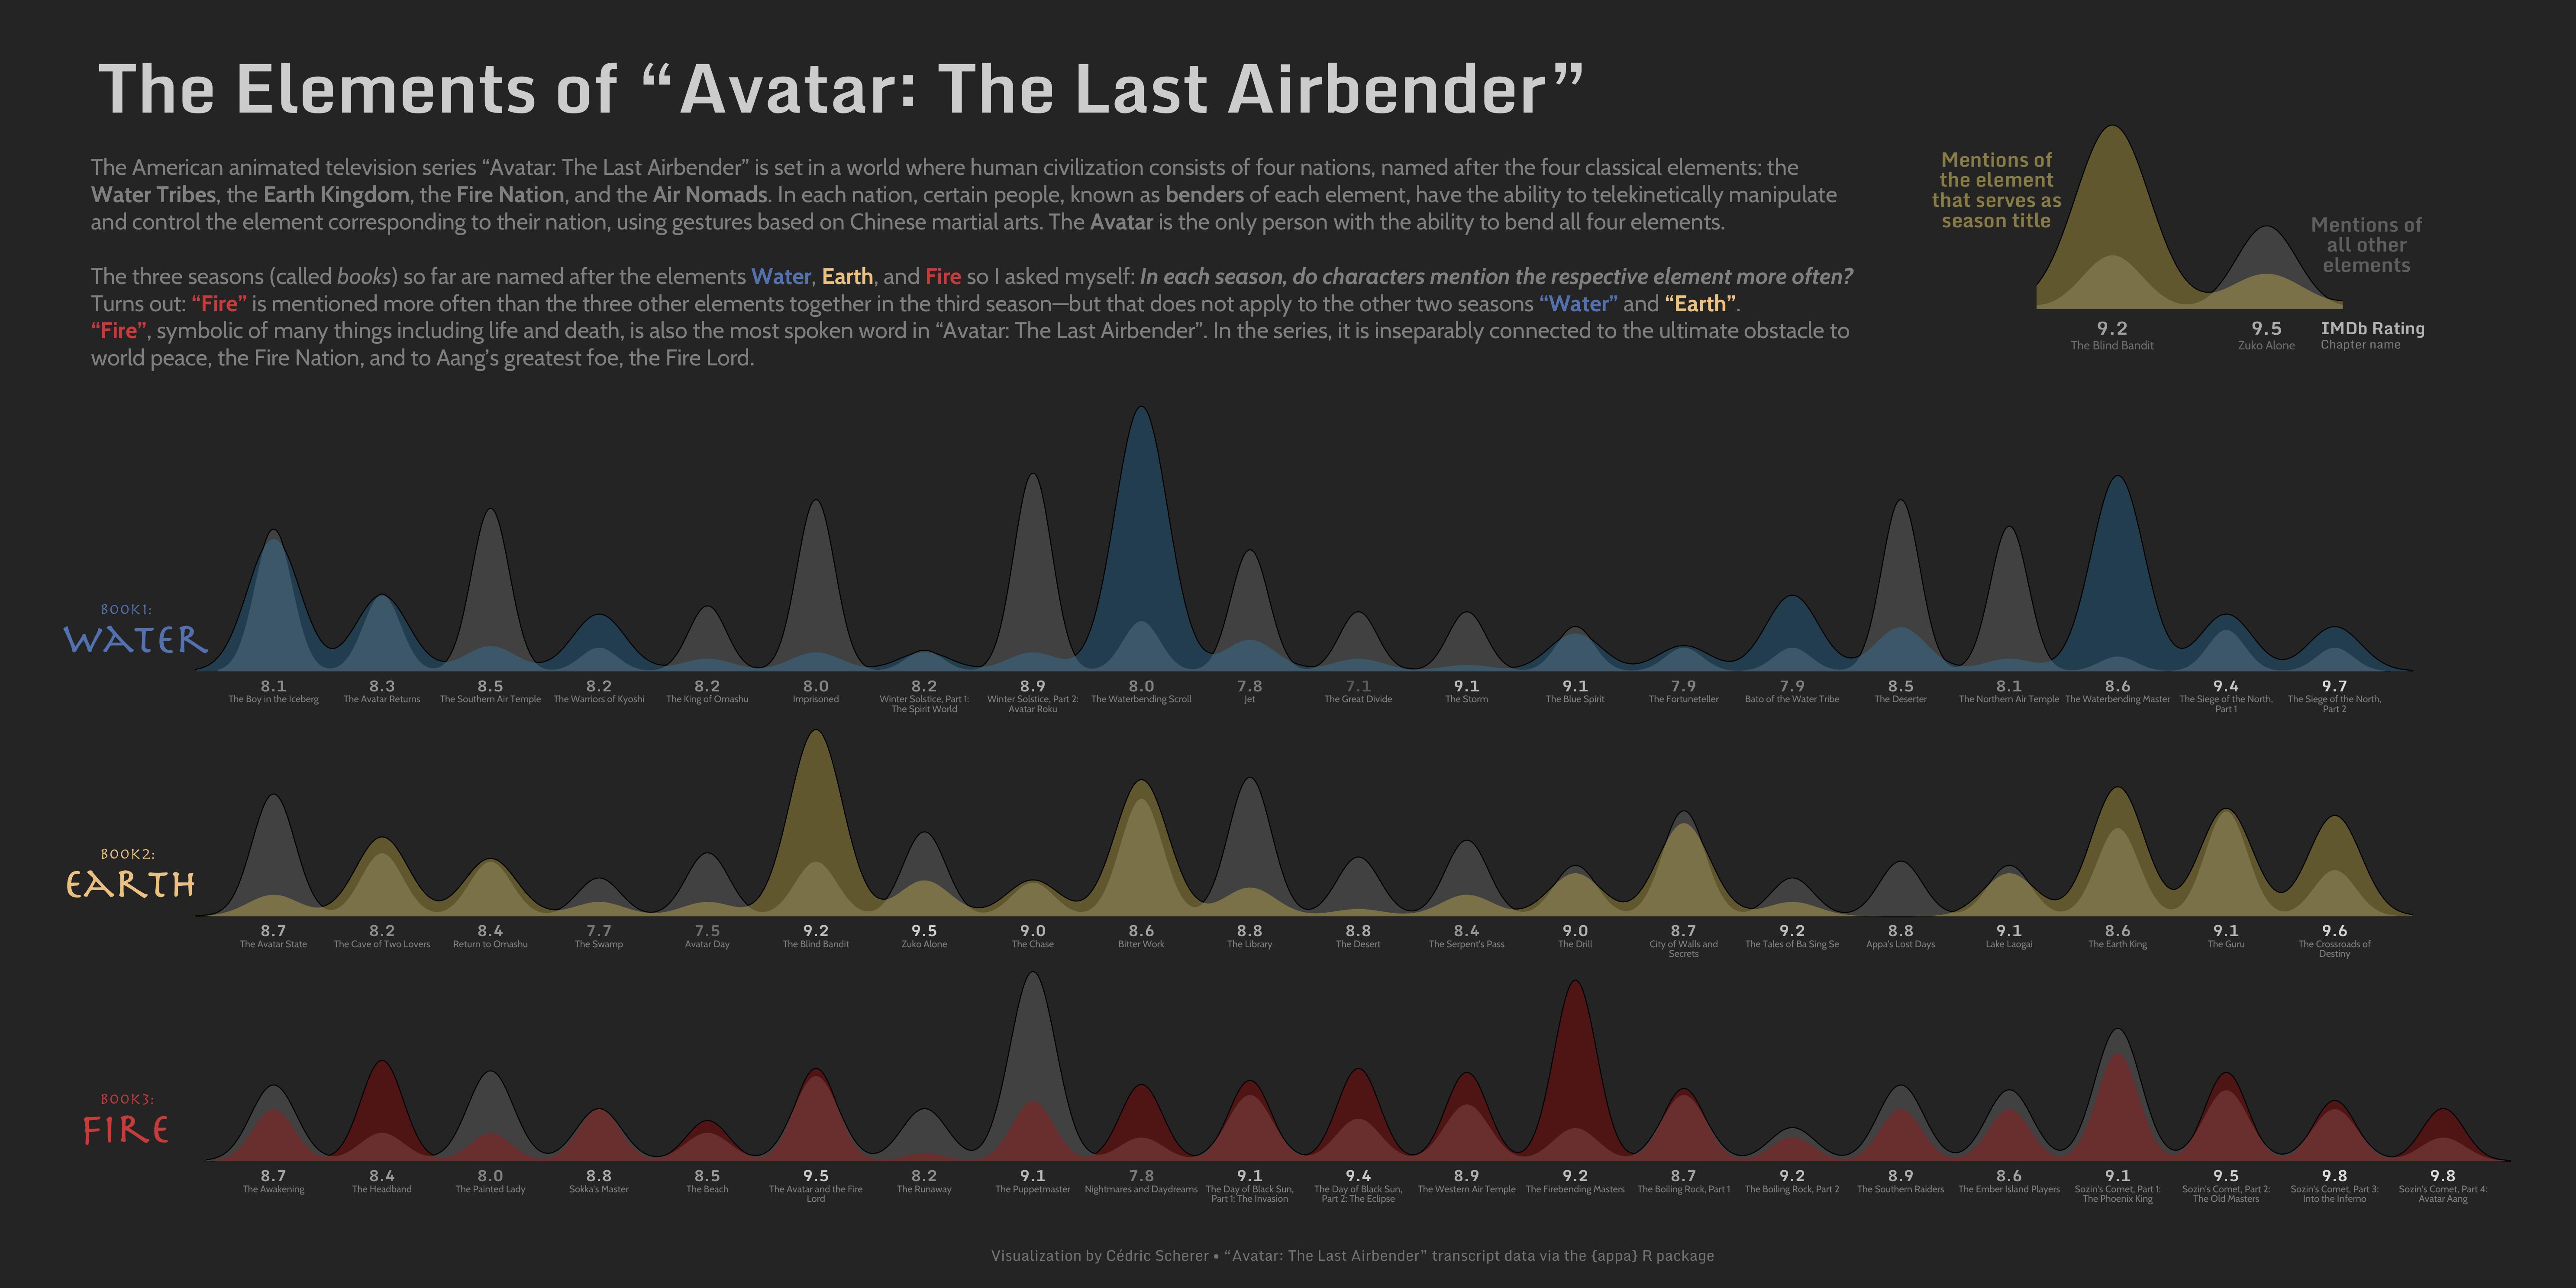 ./plots/2020_31/2020_33/2020_33_AvatarLastAirbender.png